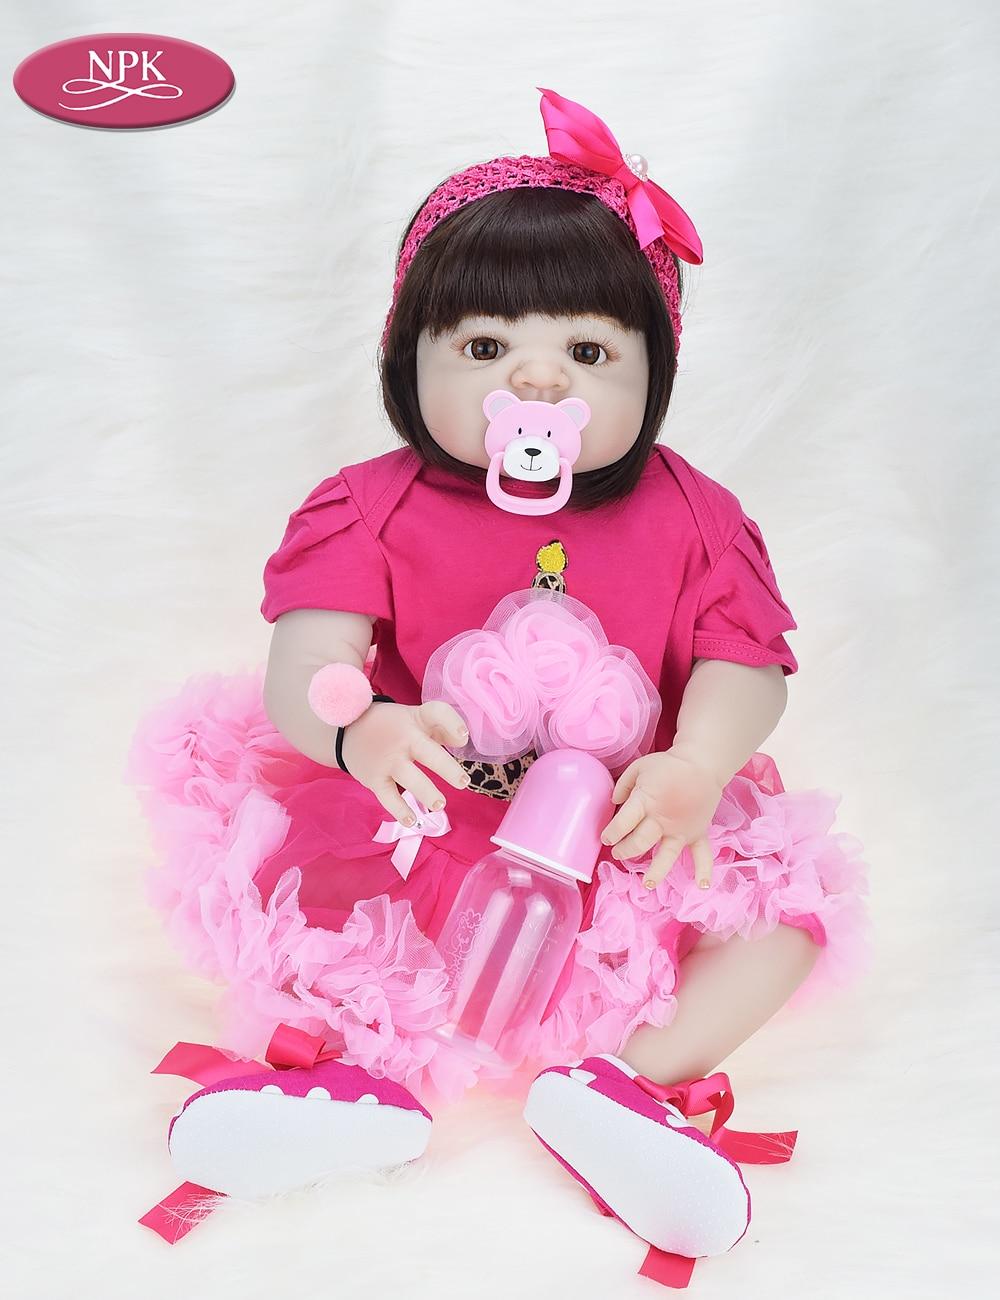 NPK 57CM Full Body Soft Silicone Girls Reborn Baby Doll Bathe Toys Lifelike Princess Girl Dolls Bebe Real Reborn Boneca Menina  (4)